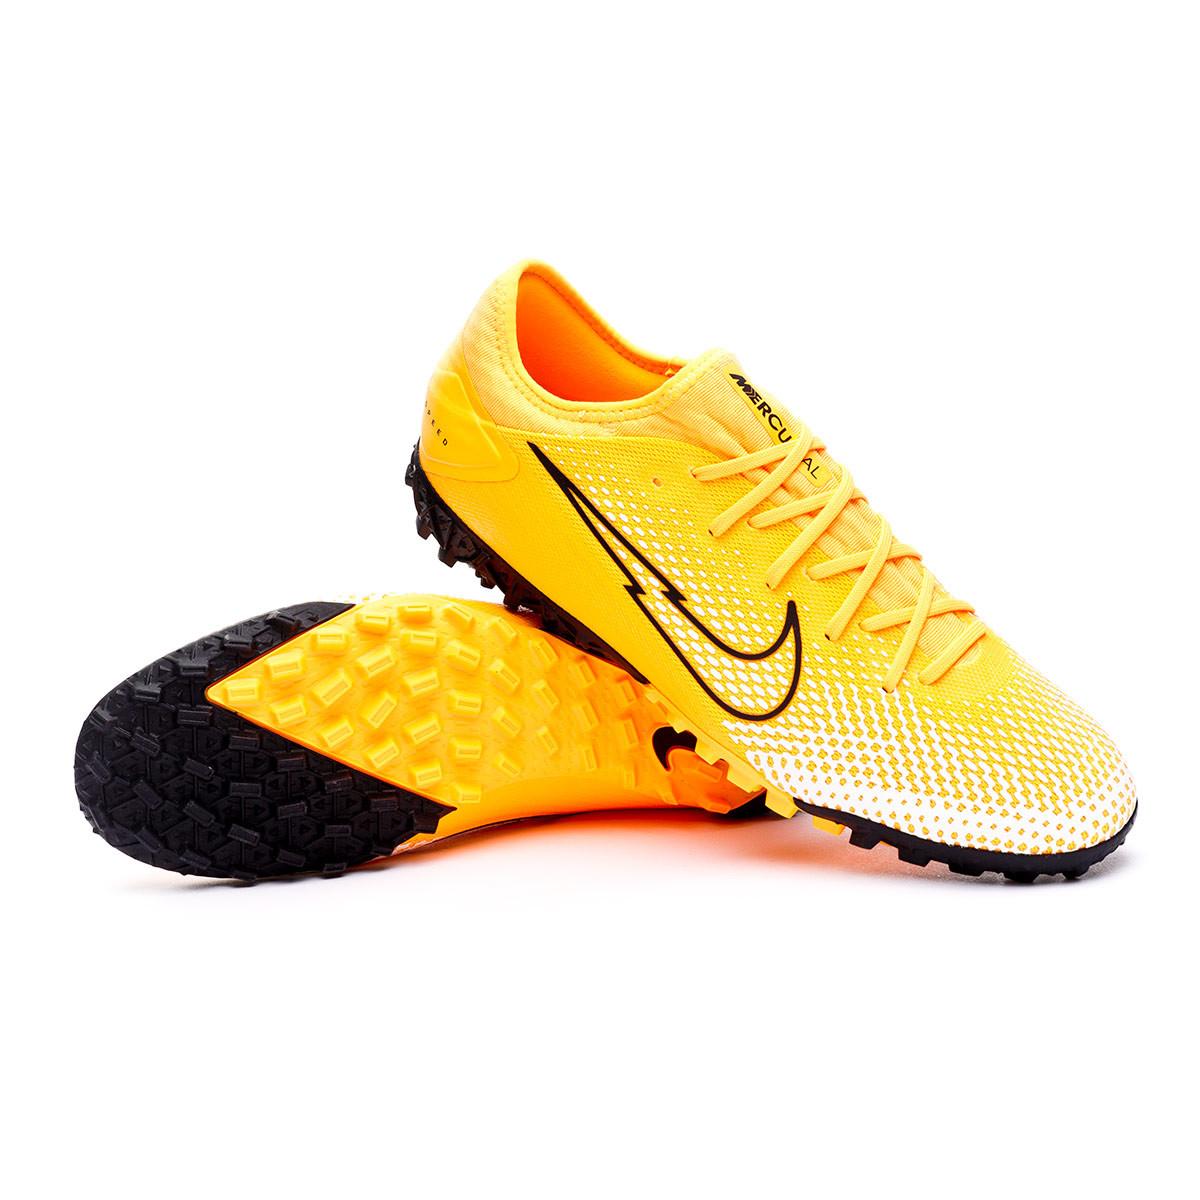 nike football boots black and orange